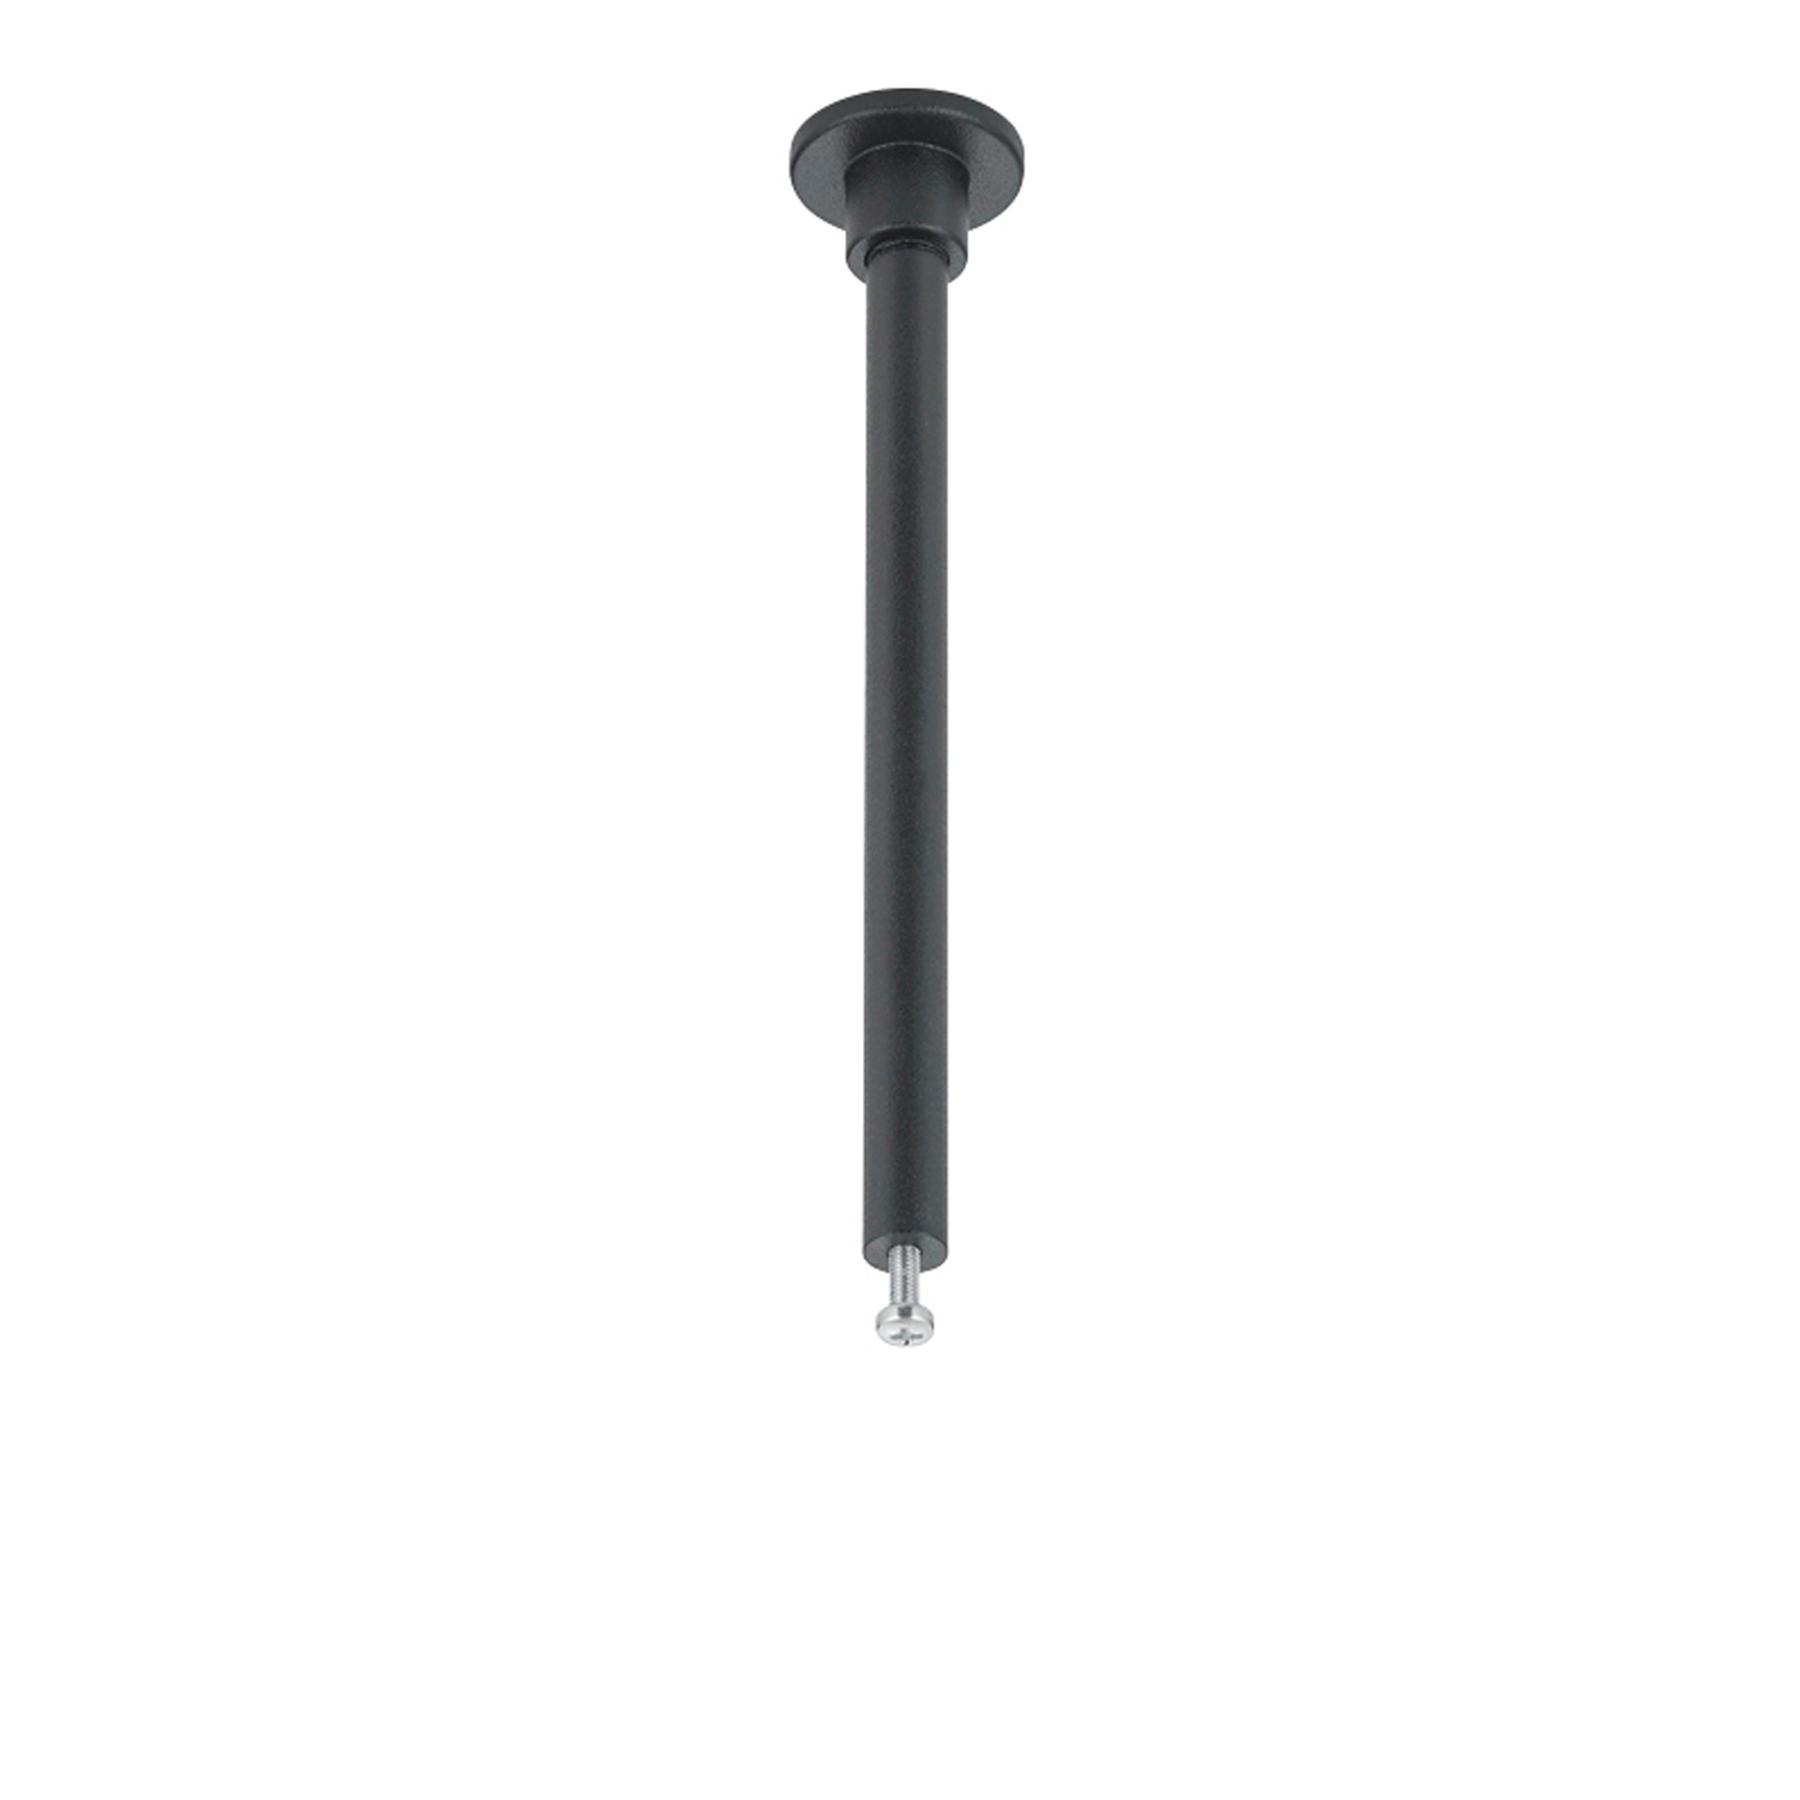 Stanga montaggio binario DUOline, nero, 12,5cm